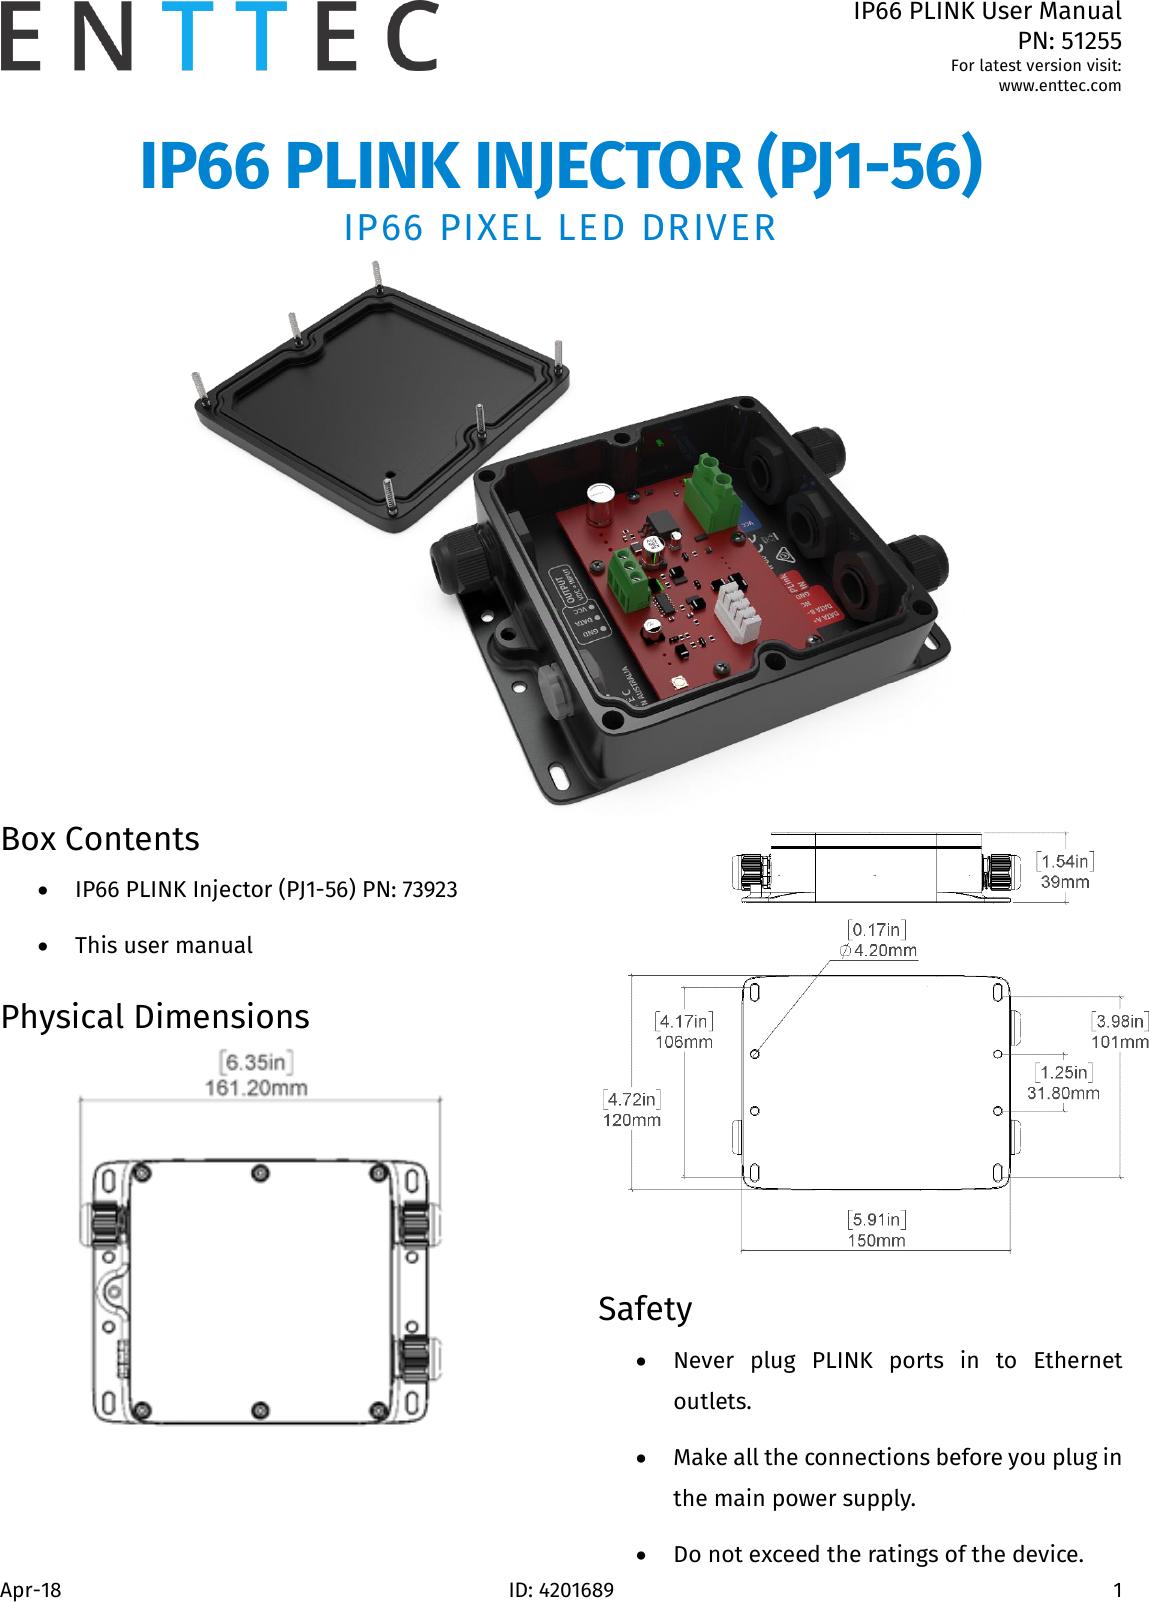 IP66 PLINK User Manual